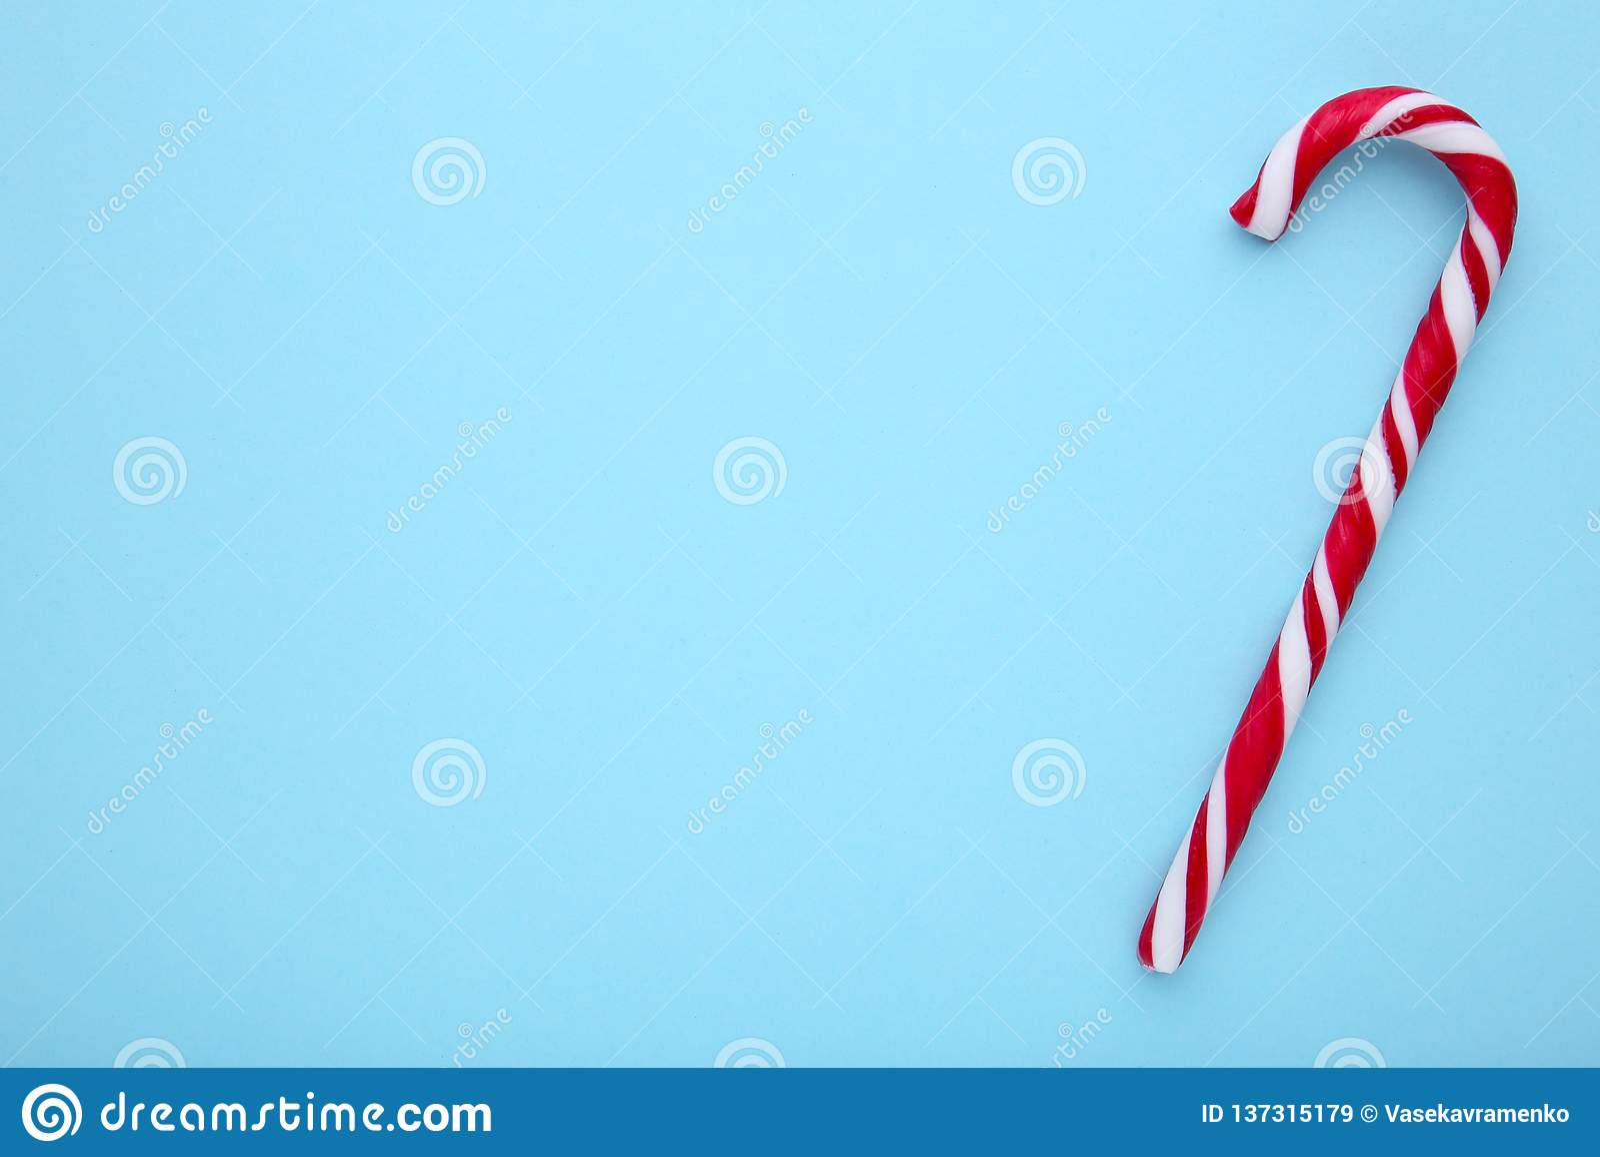 Bastones de caramelo rojos en un fondo azul, dulces